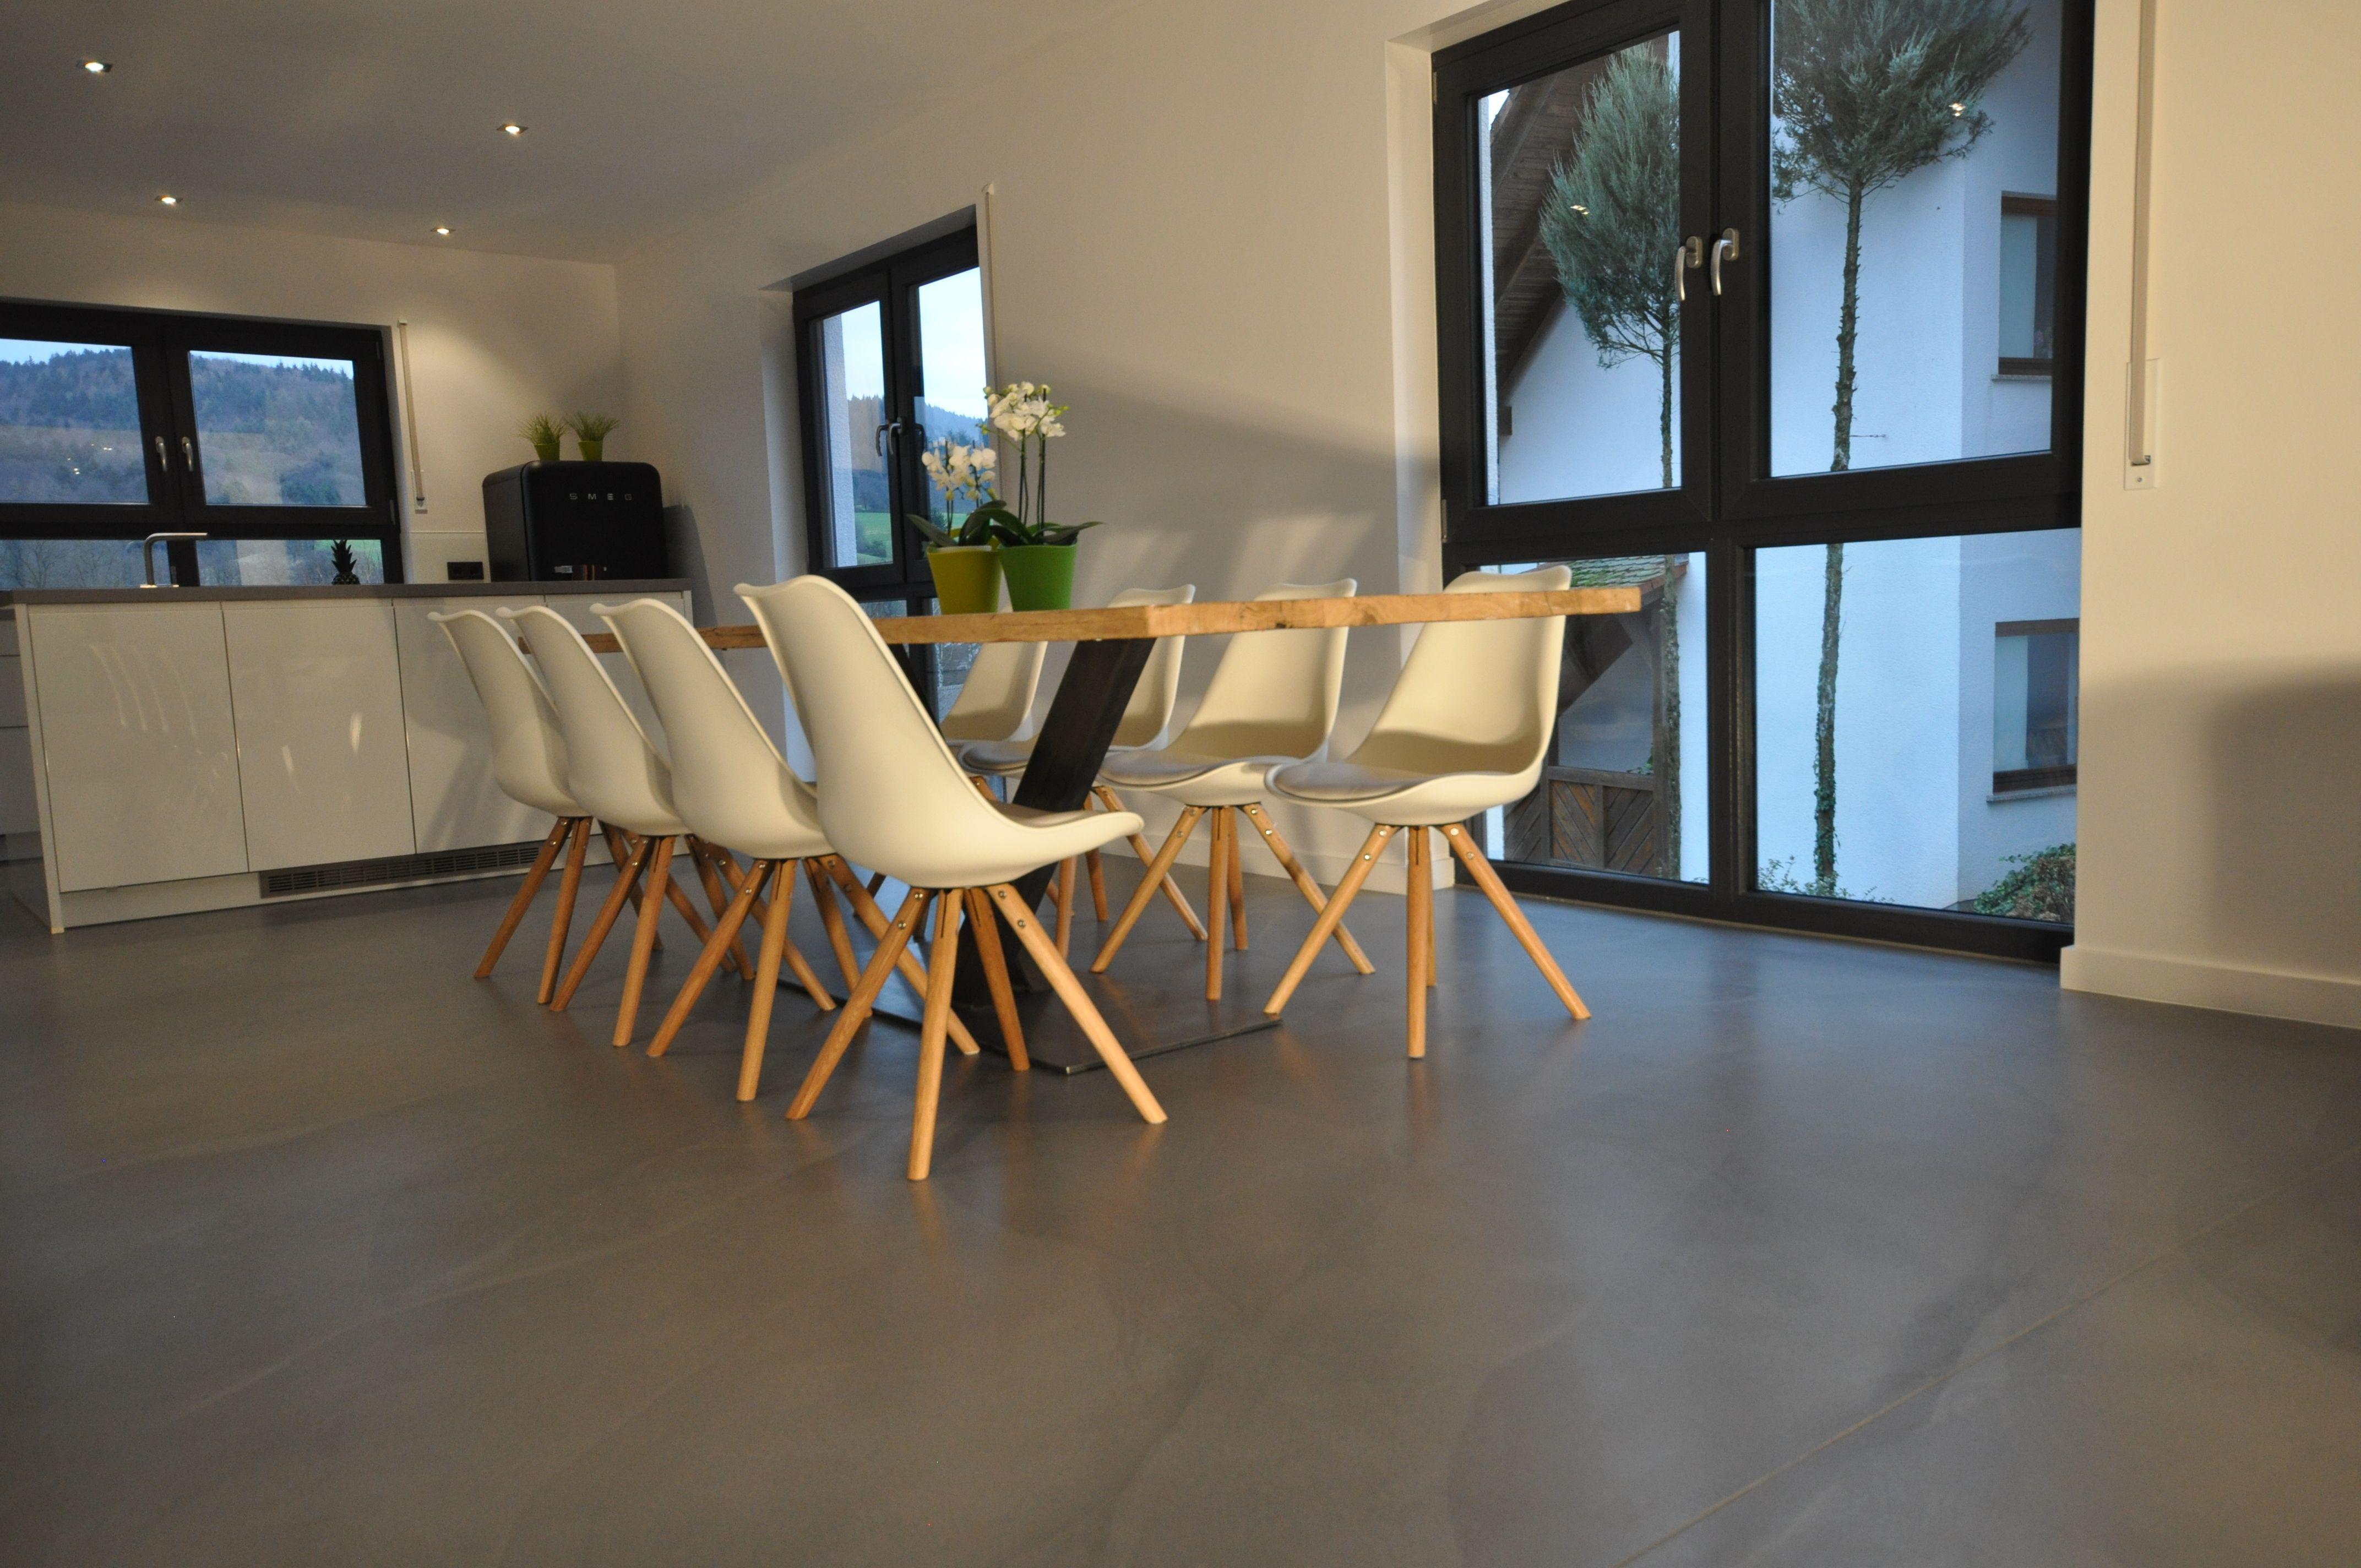 Fußboden Beton Optik ~ Designboden u fugenloser boden u fugenlose oberfläche u betonoptik